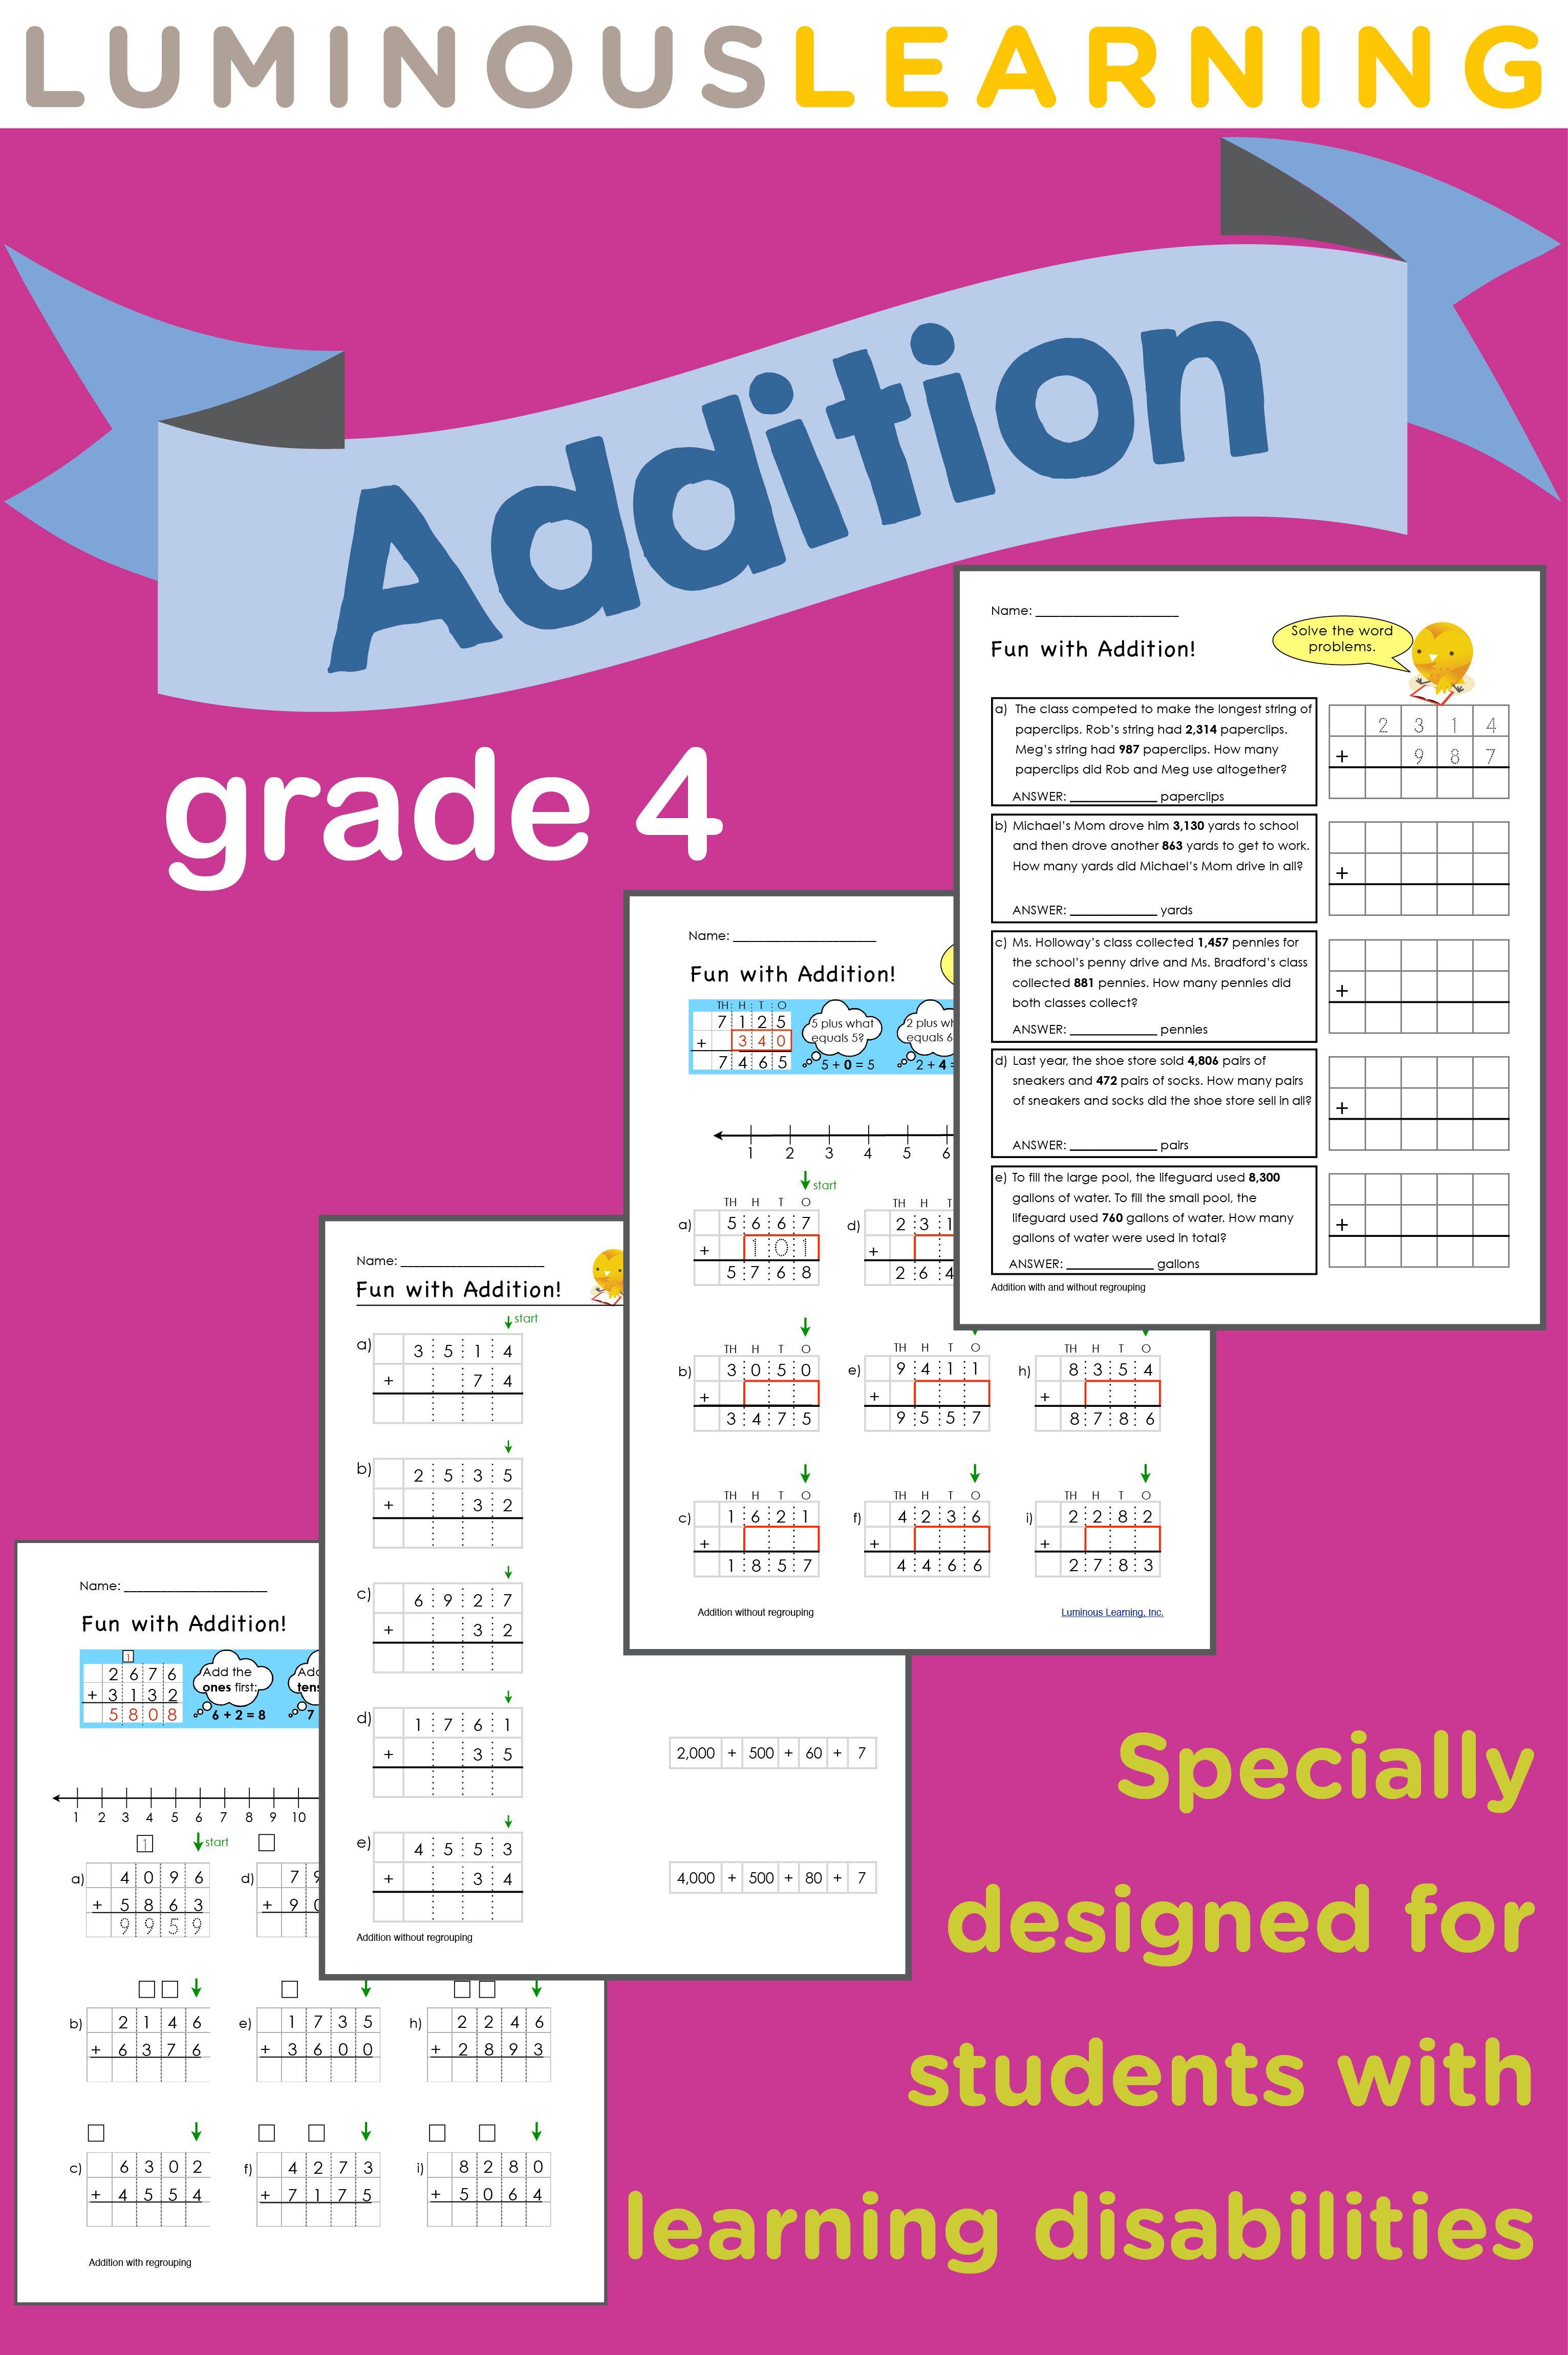 Luminous Learning Grade 4 Addition Workbook Is Designed